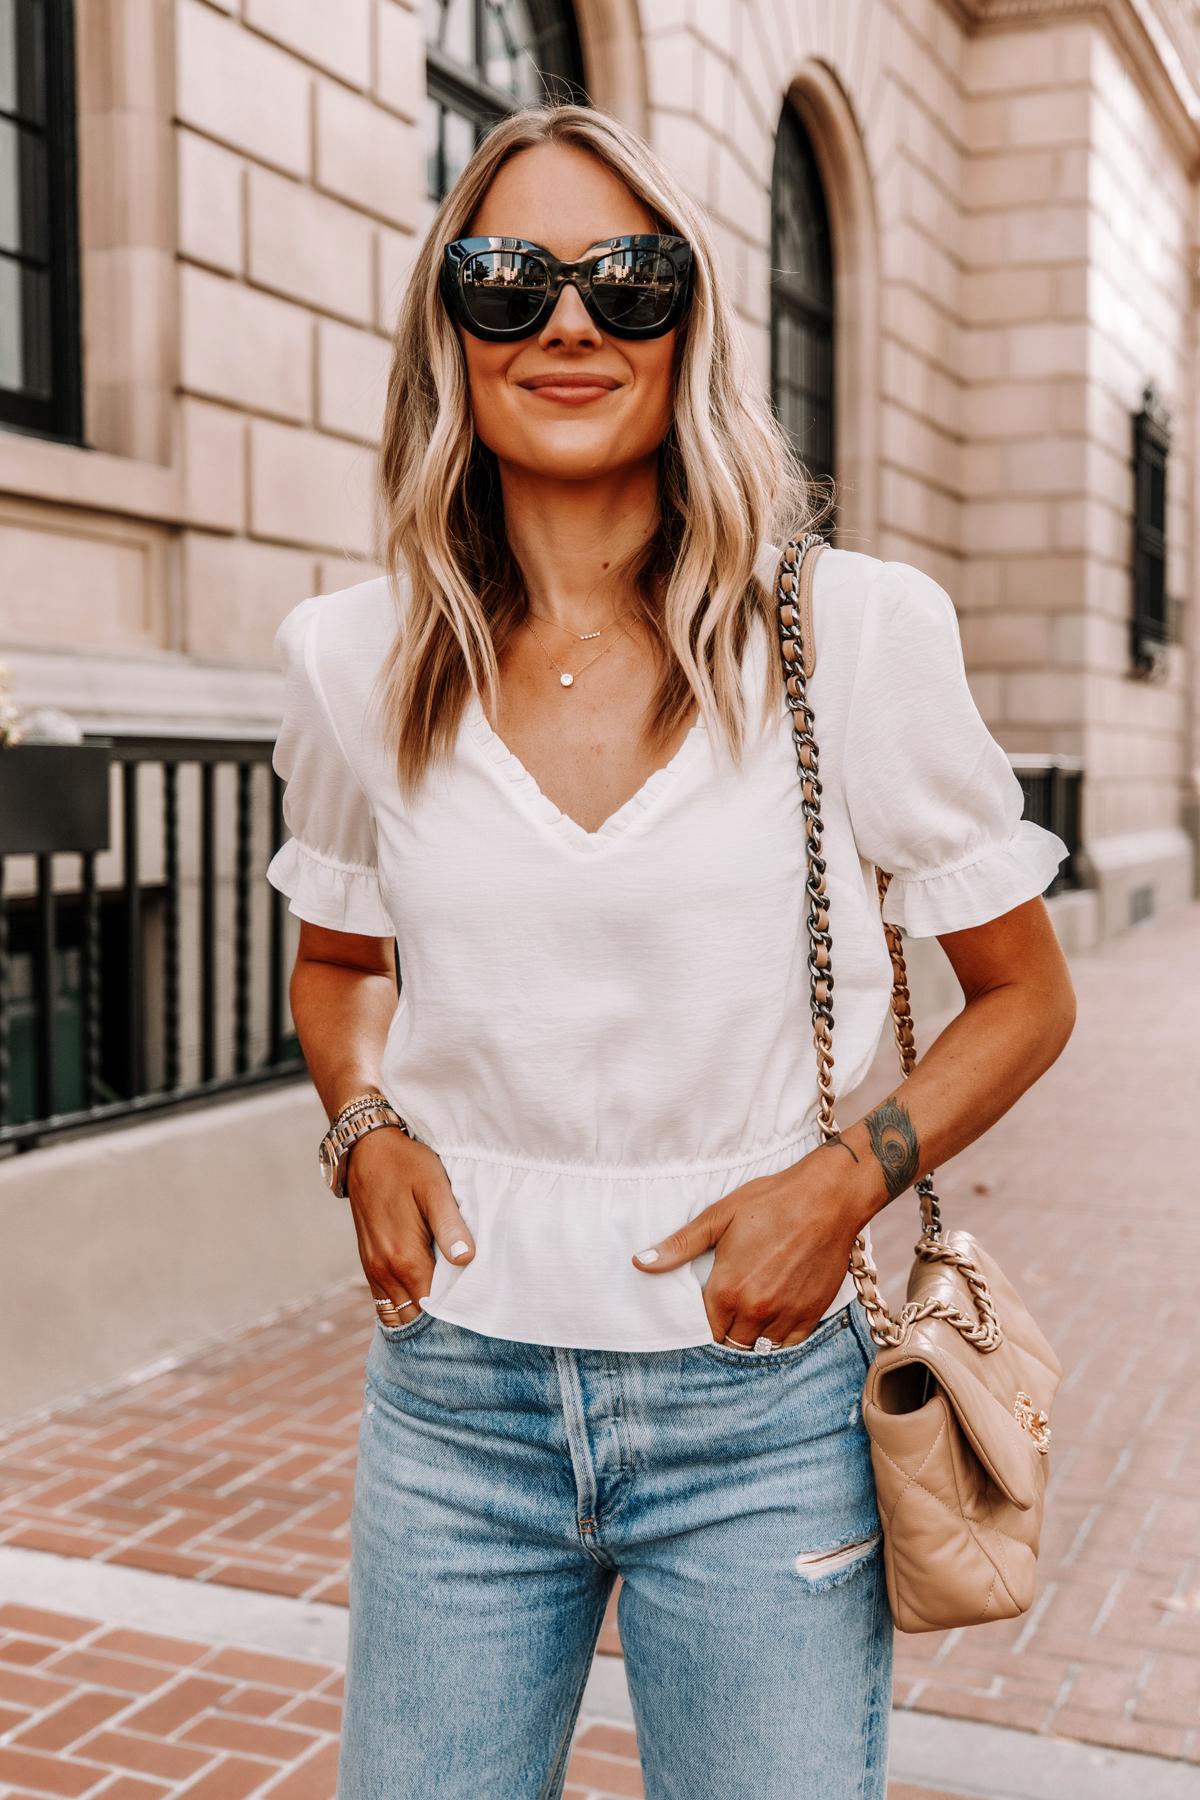 Fashion Jackson Wearing Topshop White Peplum Top Ripped Jeans Chanel 19 Beige Handbag